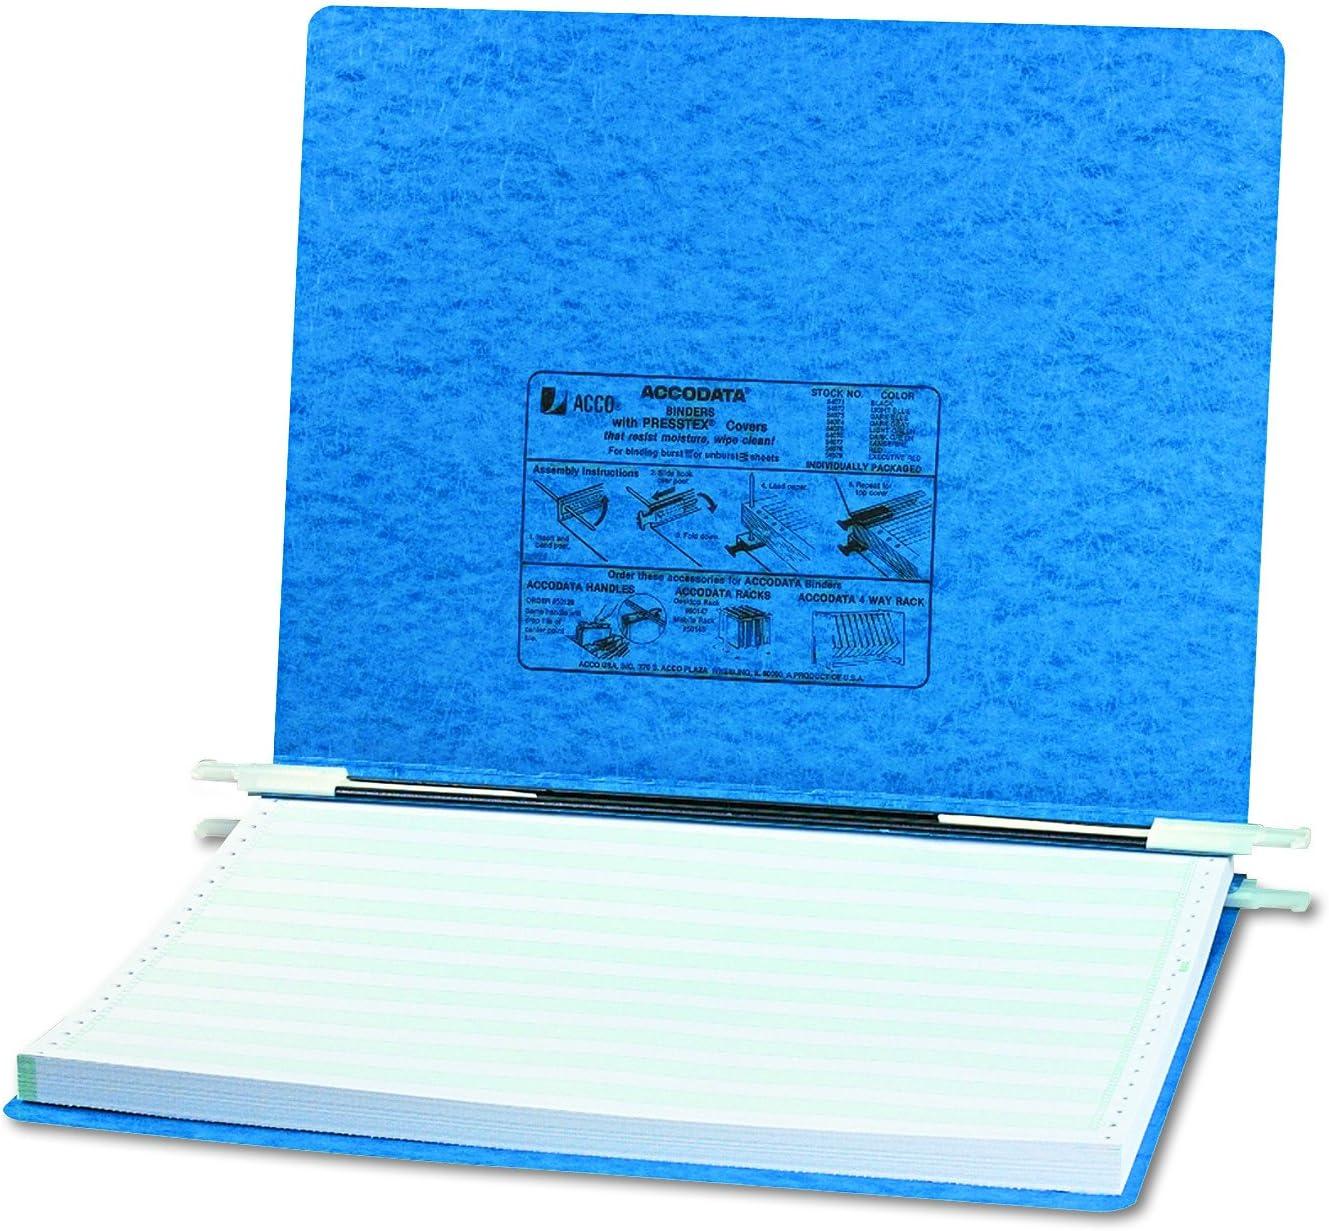 Acco Pressboard Hanging Data Binder ACC54076